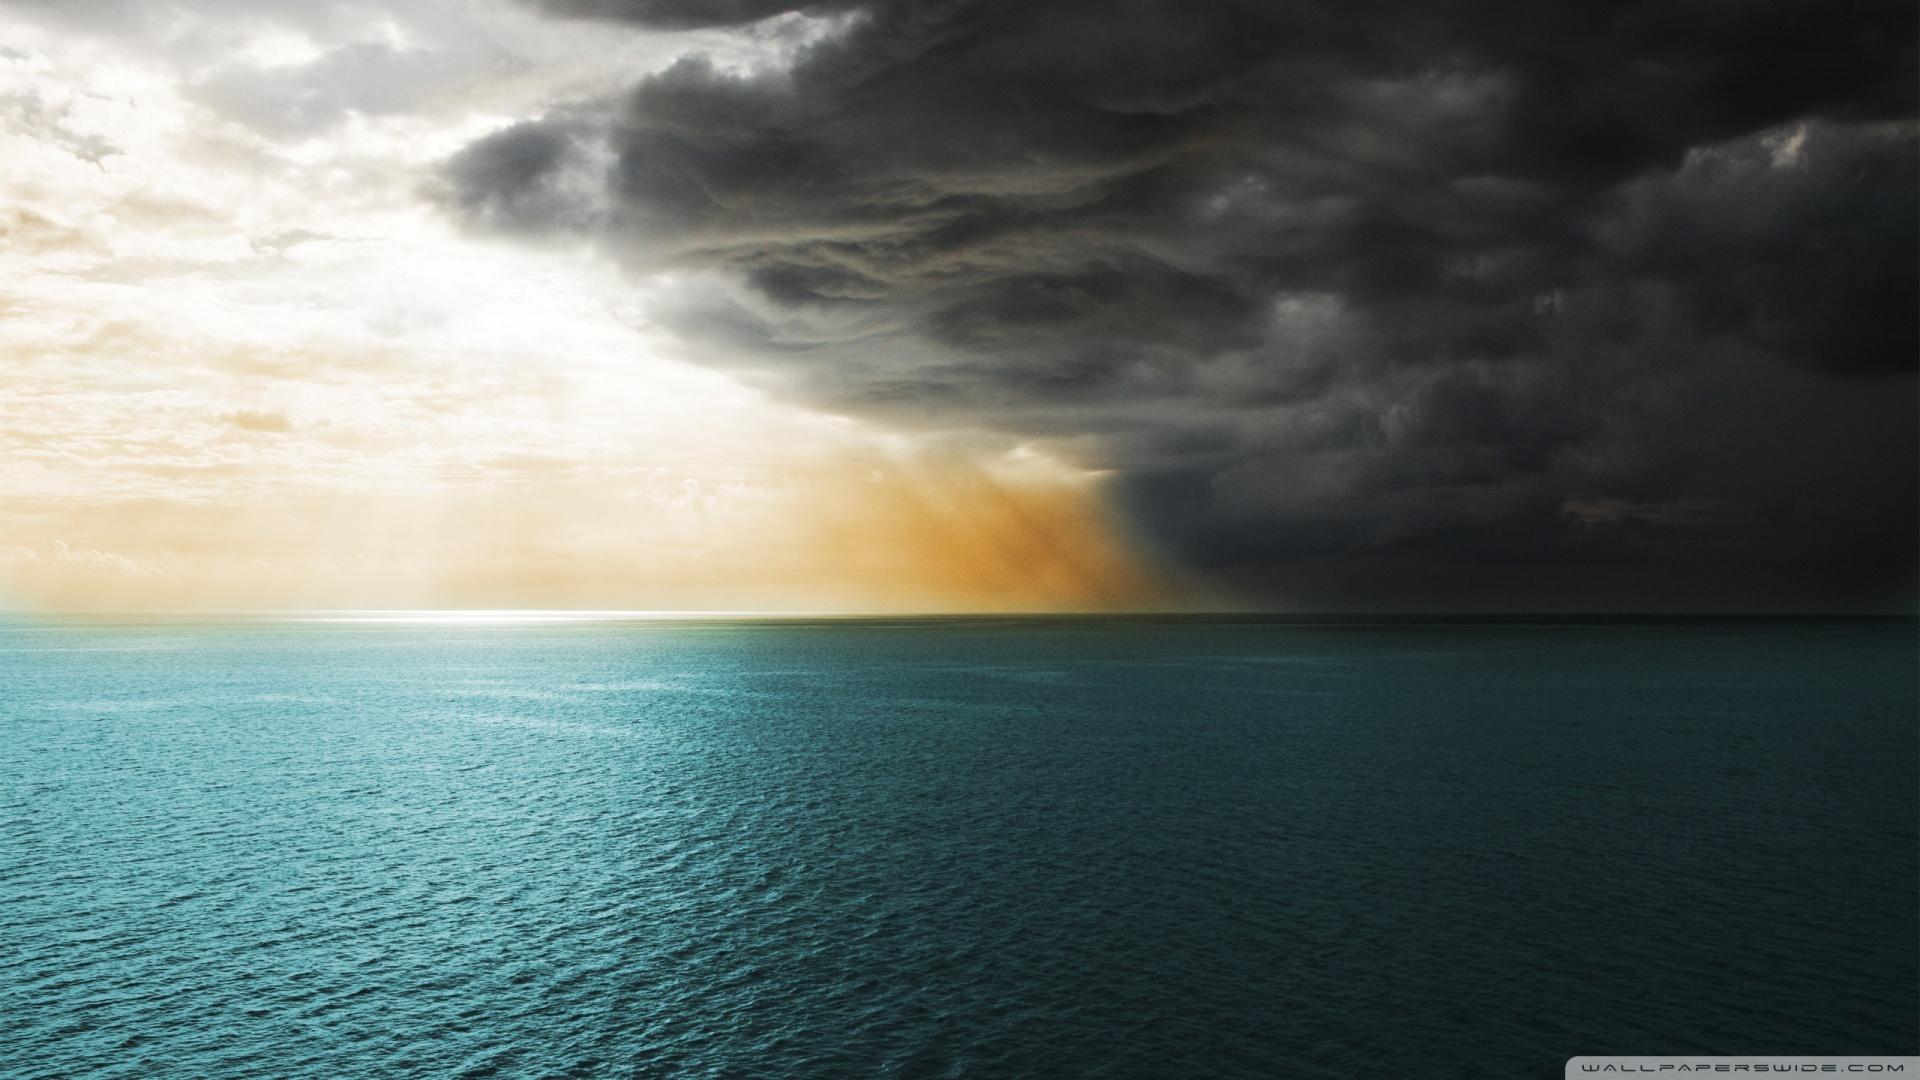 Sea Storm HD desktop wallpaper : High Definition : Fullscreen : Mobile